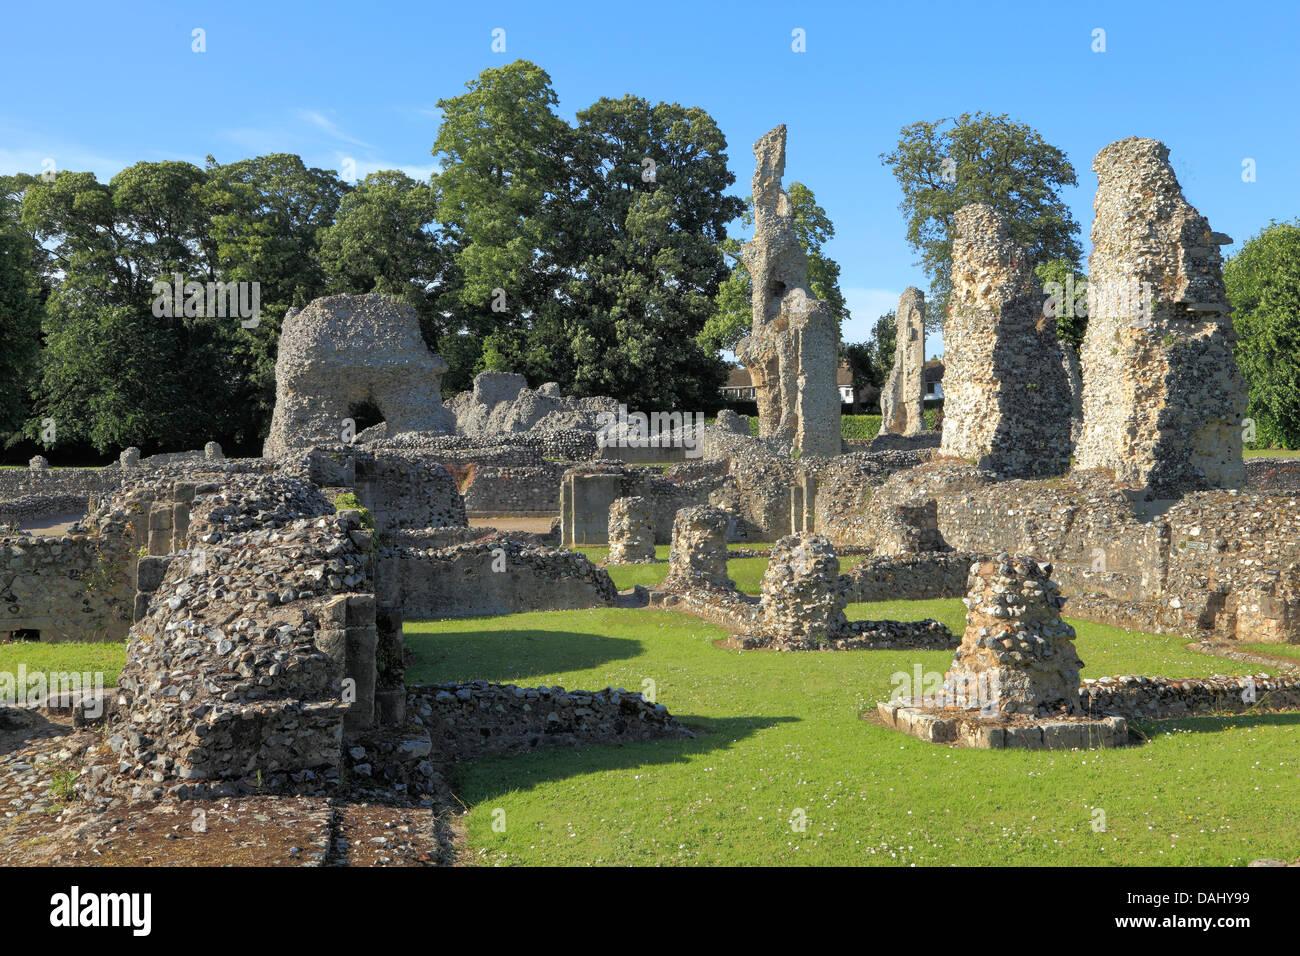 Thetford Priory, ruins of Cluniac Priory, Norfolk England UK English medieval Priories - Stock Image